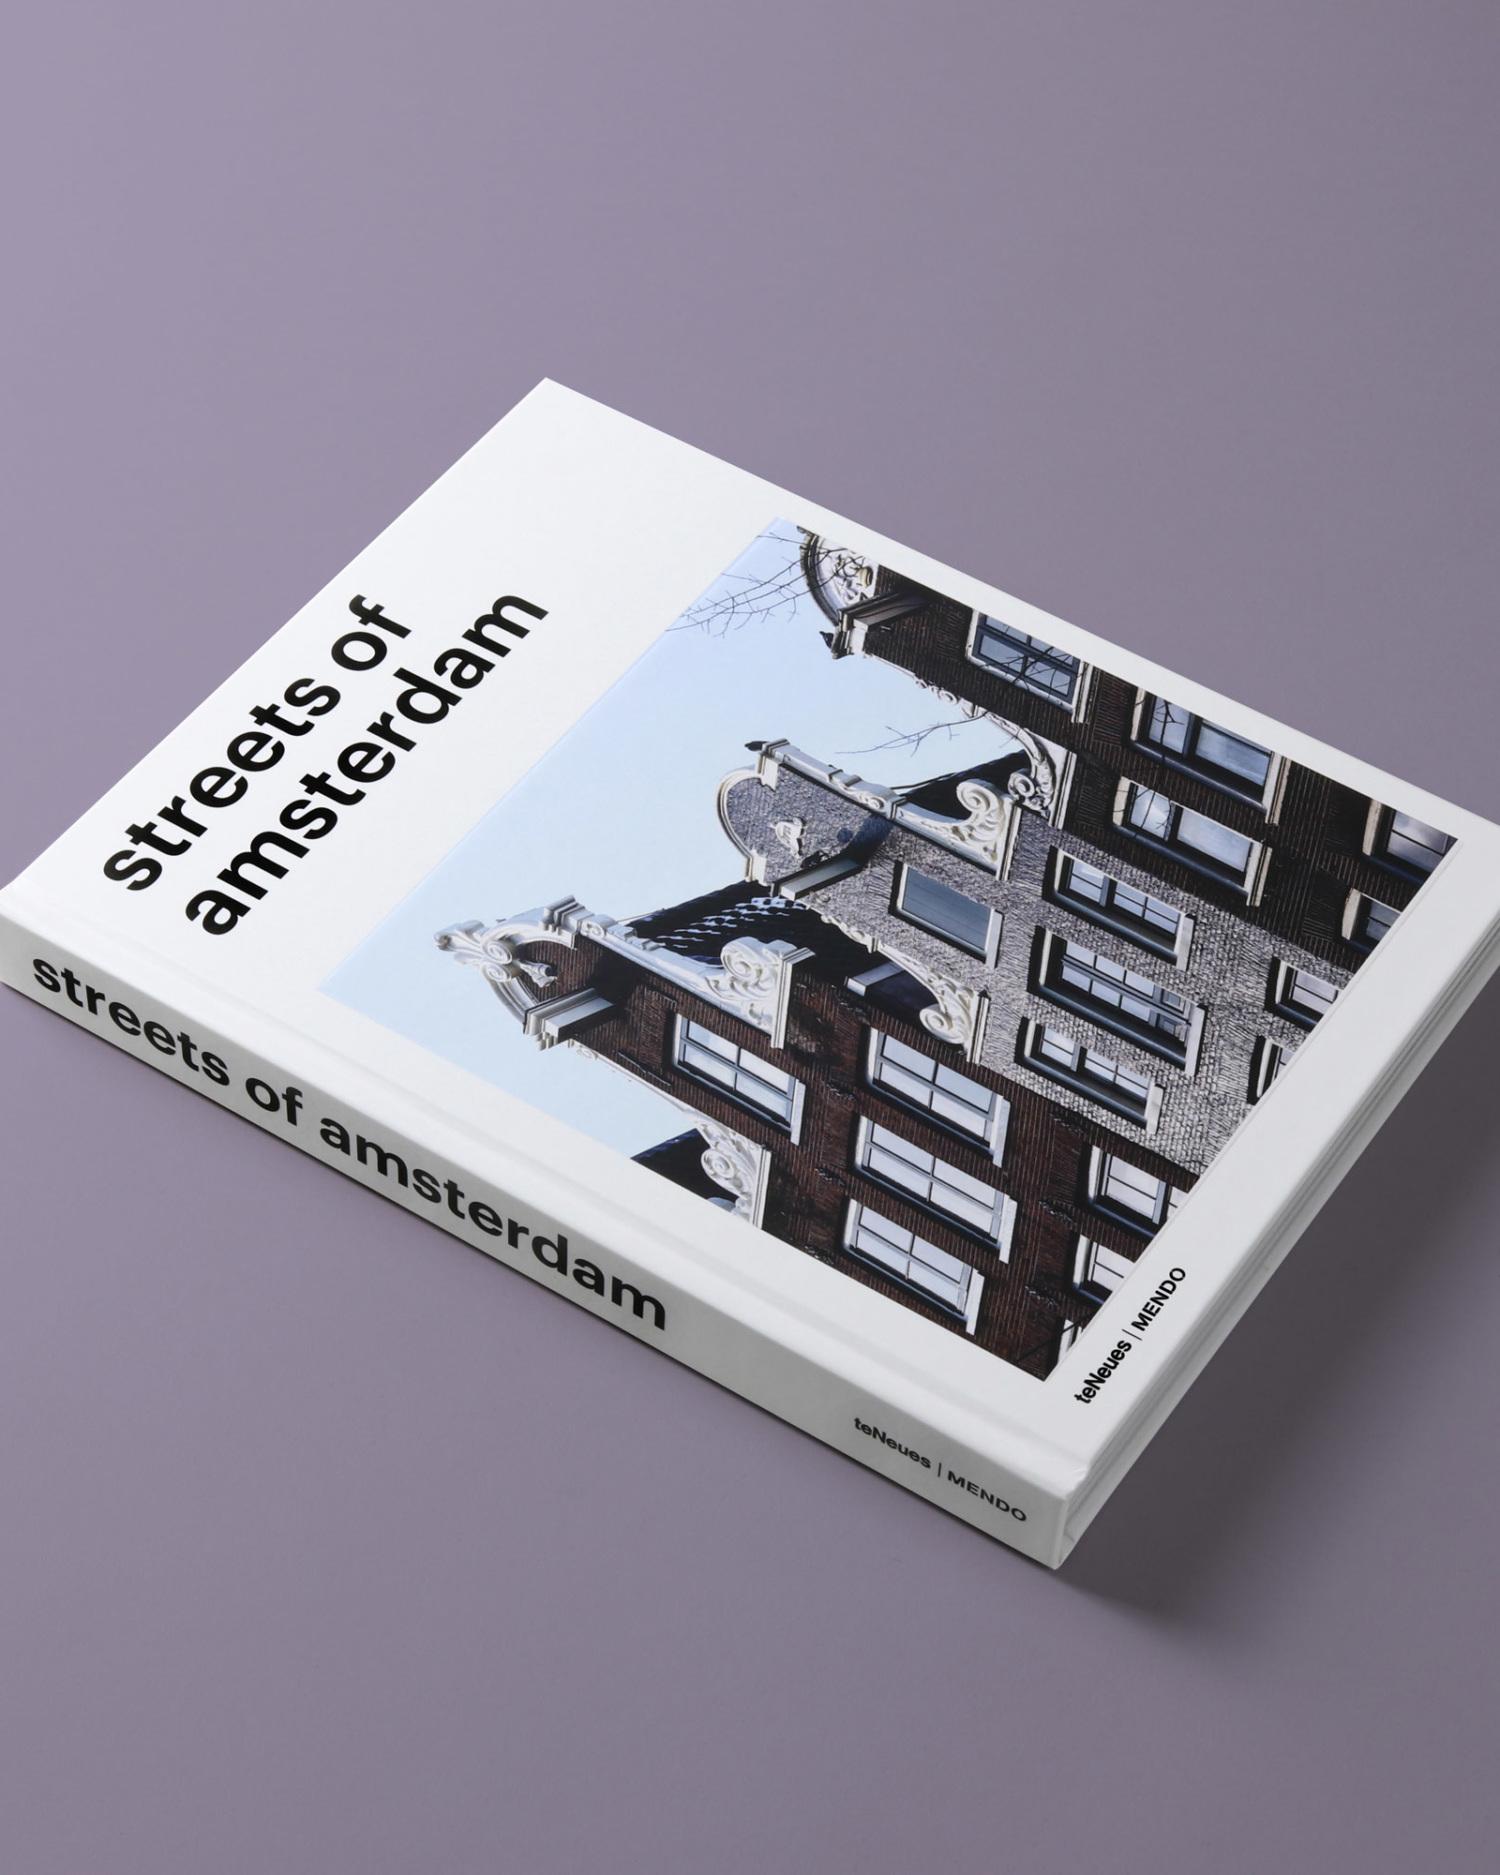 mendo-book-streets-of-amsterdam-studio-22-1500x1875-c-default.jpg